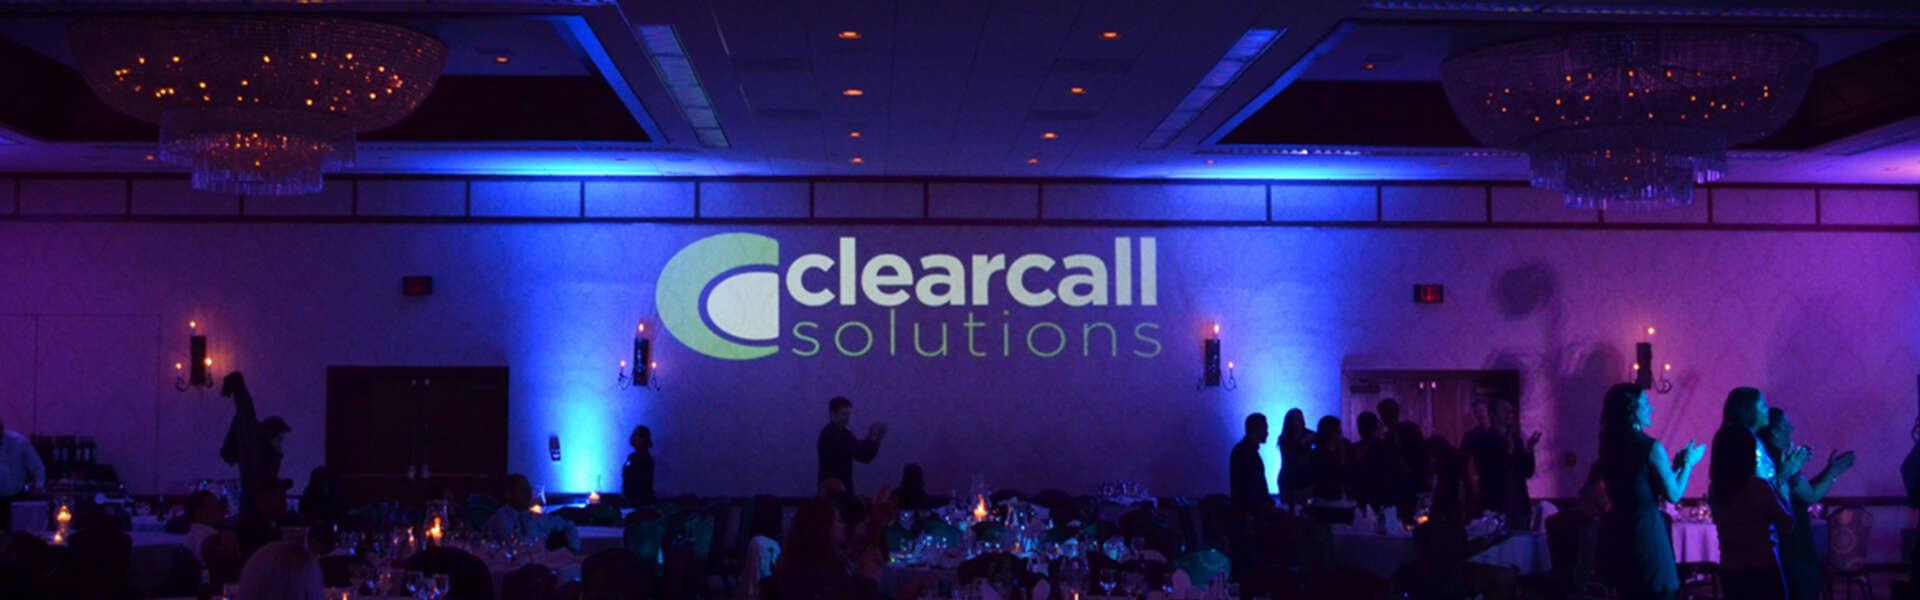 LED Video Wall, Audio Visual, Speakers, Line Array, Truss, Moving Heads, Martin Mac Aura, Staging, Lighting, JBL Vertec, Conference, Summit, AV, Toronto, Product Launch, AV Production, Audio Visual Production